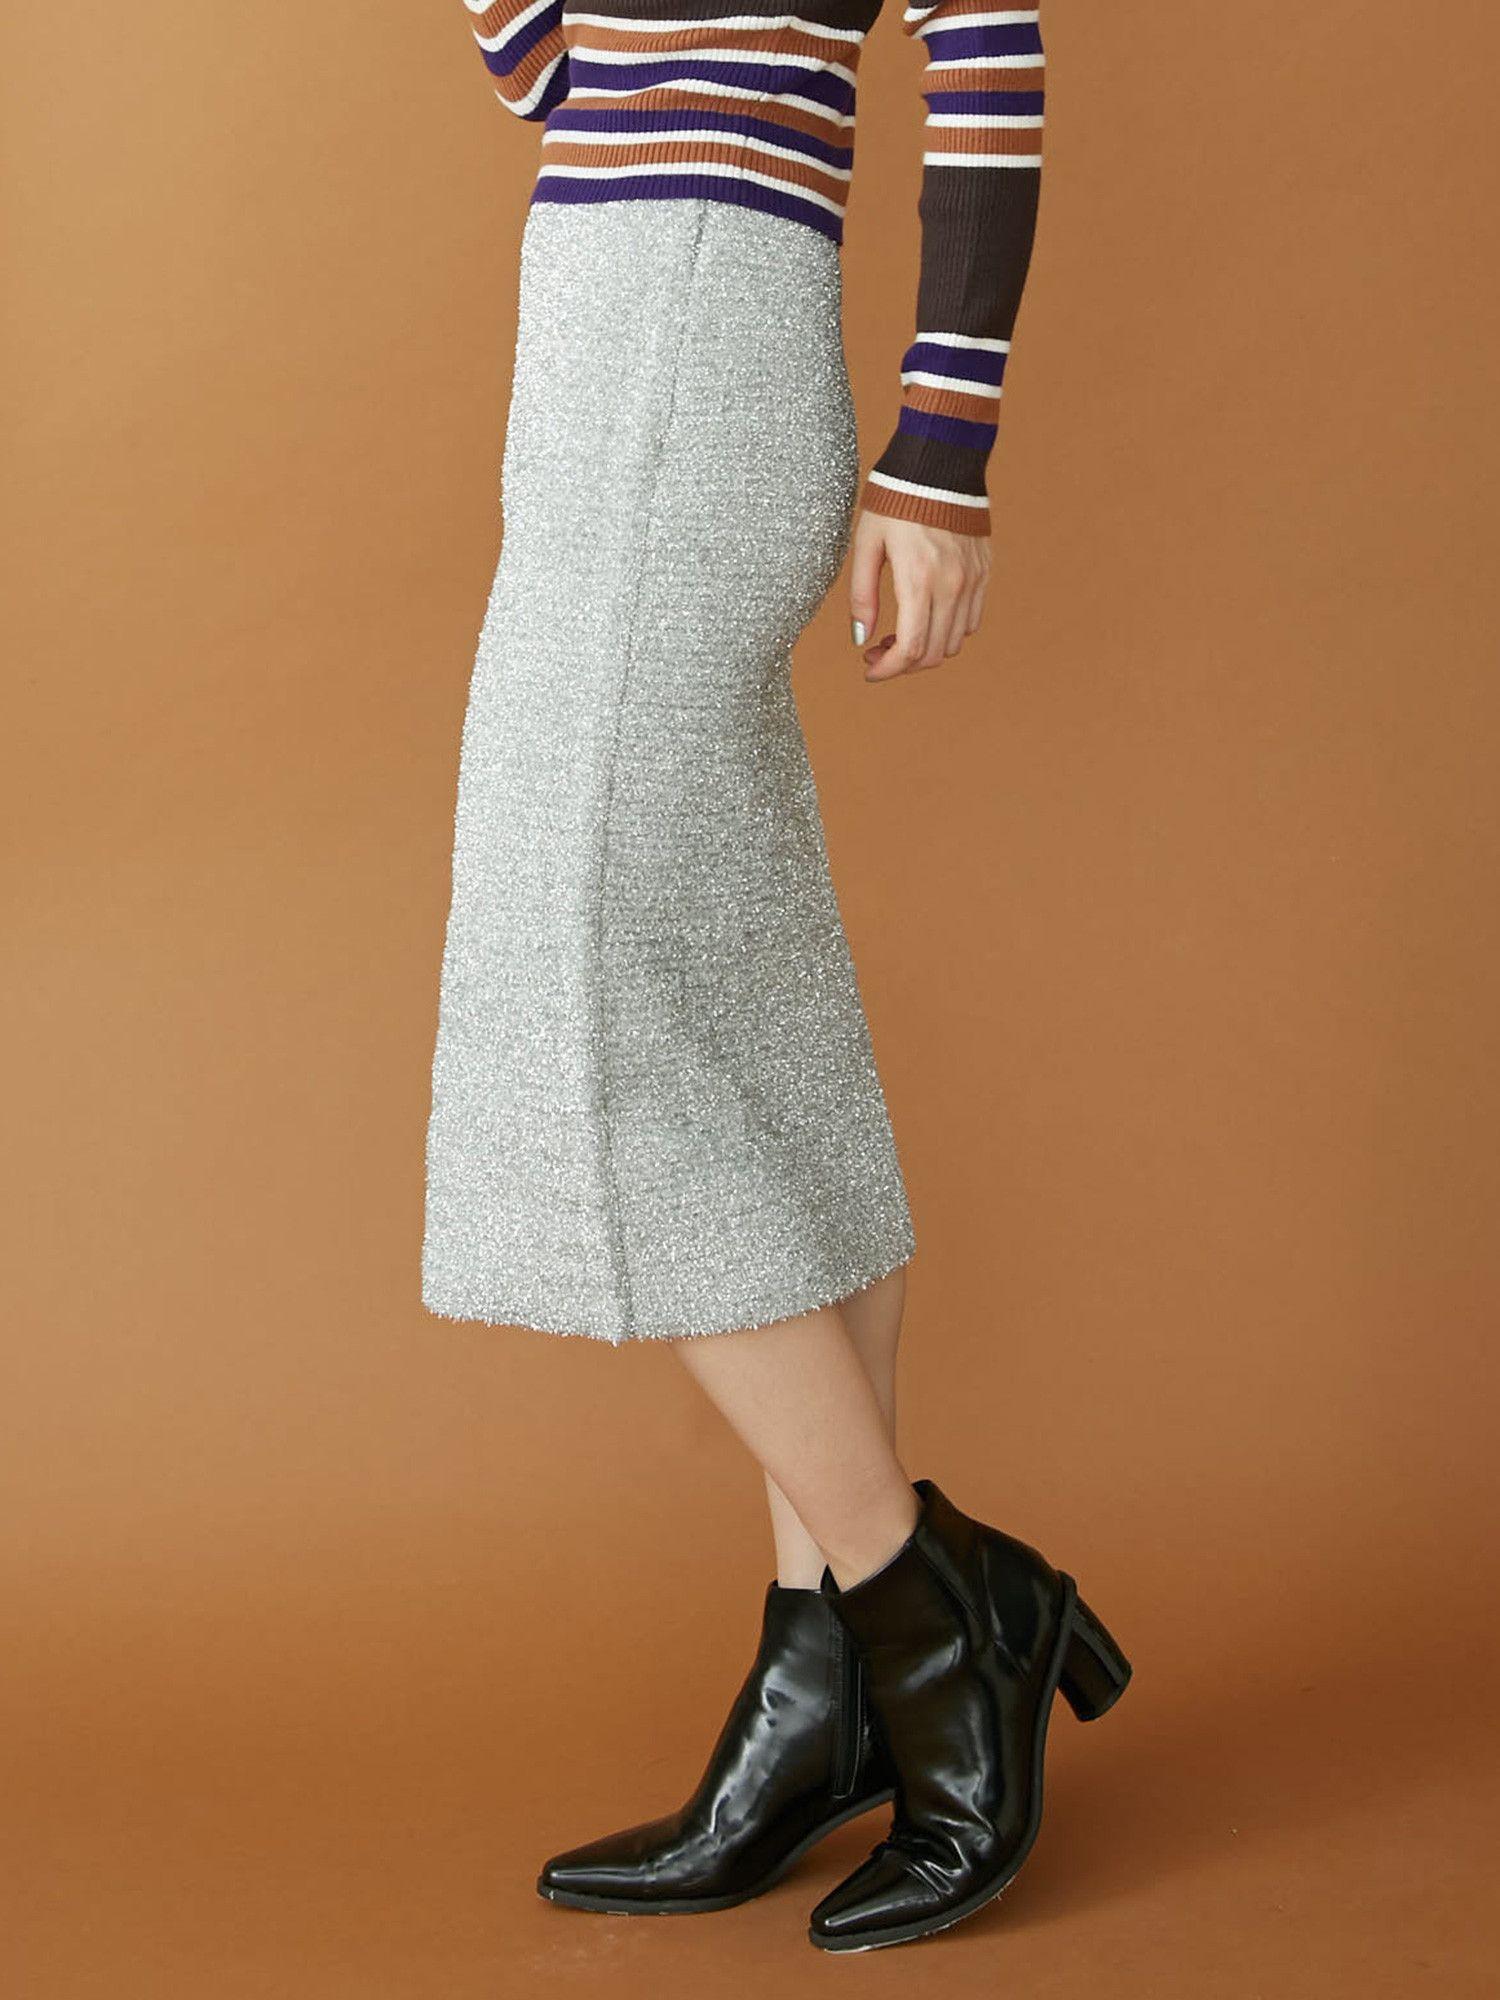 Lame knit skirt